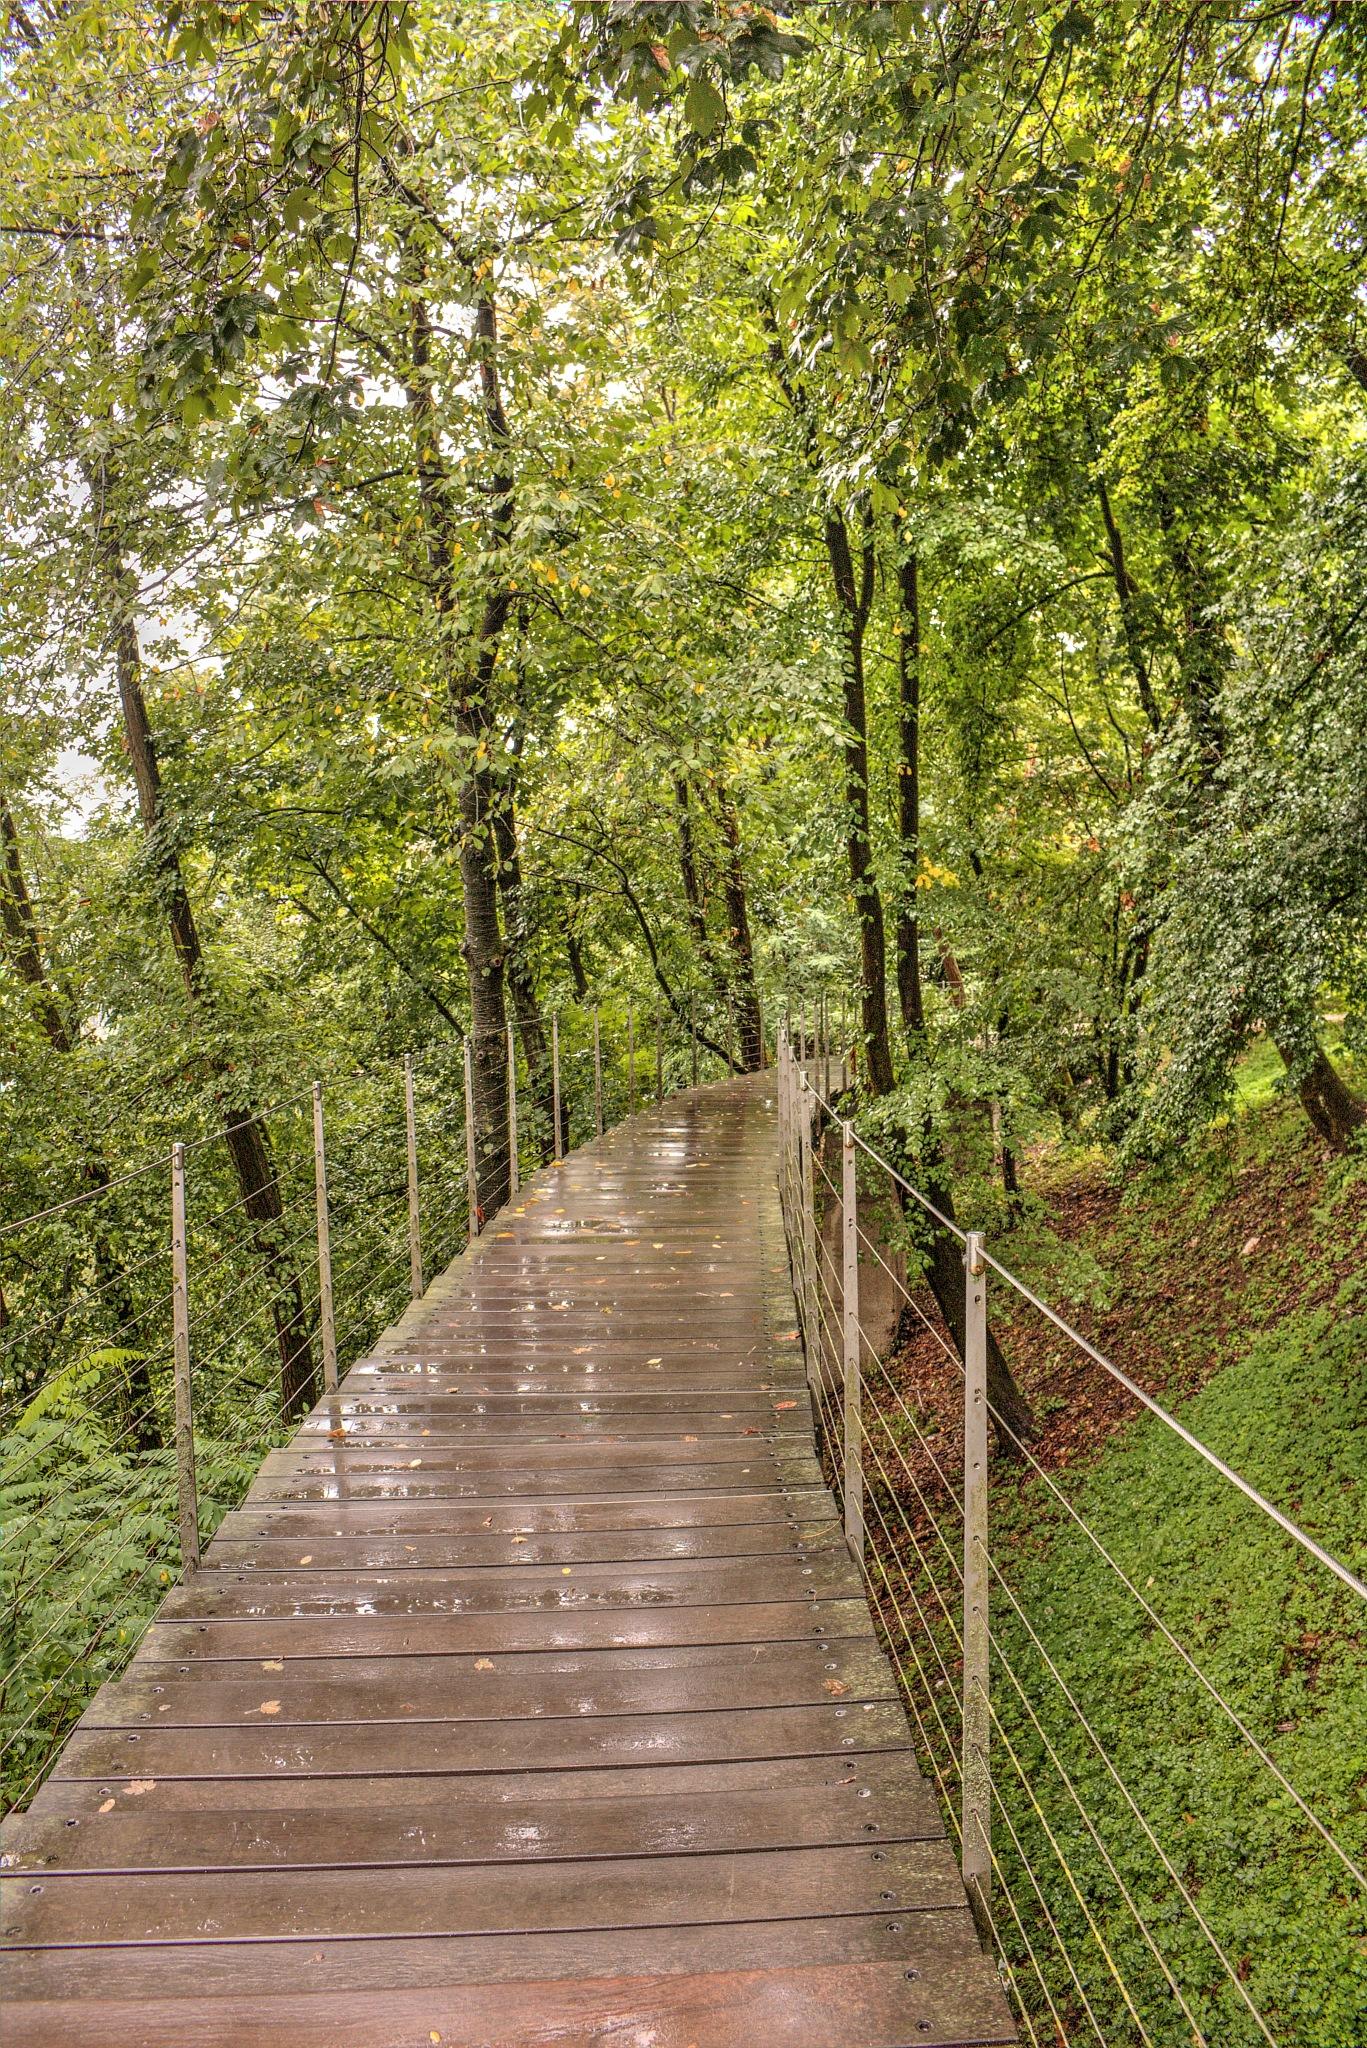 Grajski hrib, pot v mesto Ljubljana by zvnktomasevic